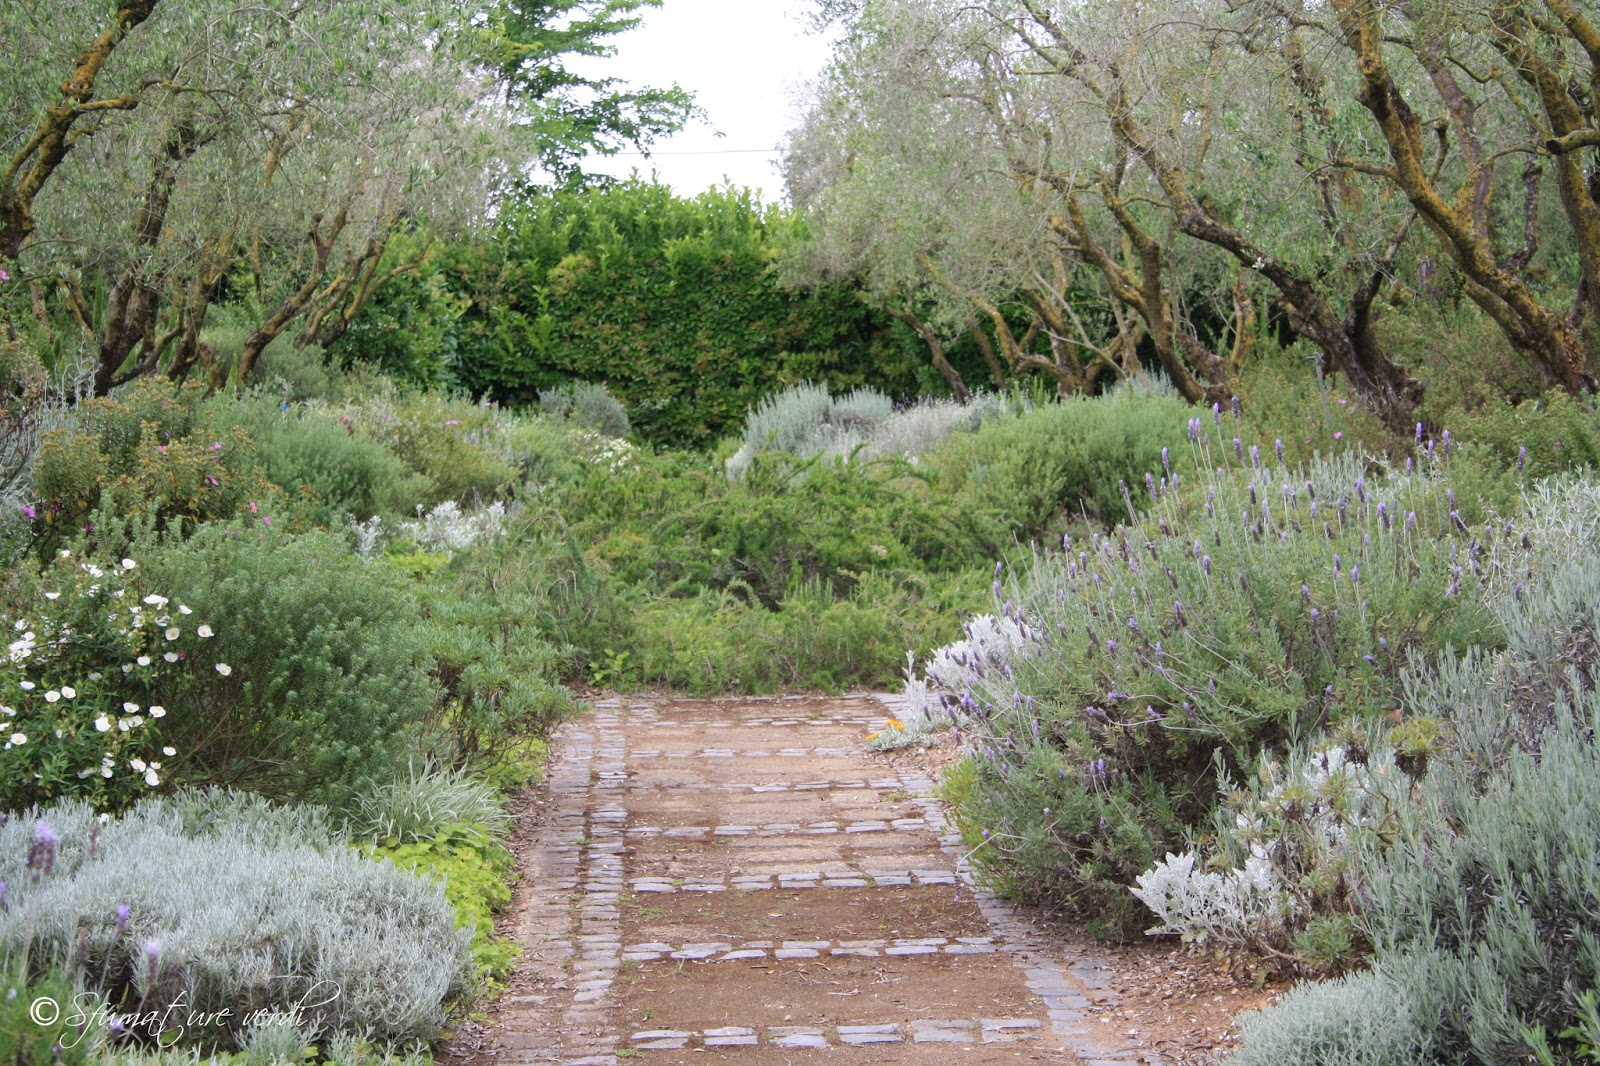 Progetto giardino mediterraneo vr41 regardsdefemmes - Giardini mediterranei ...